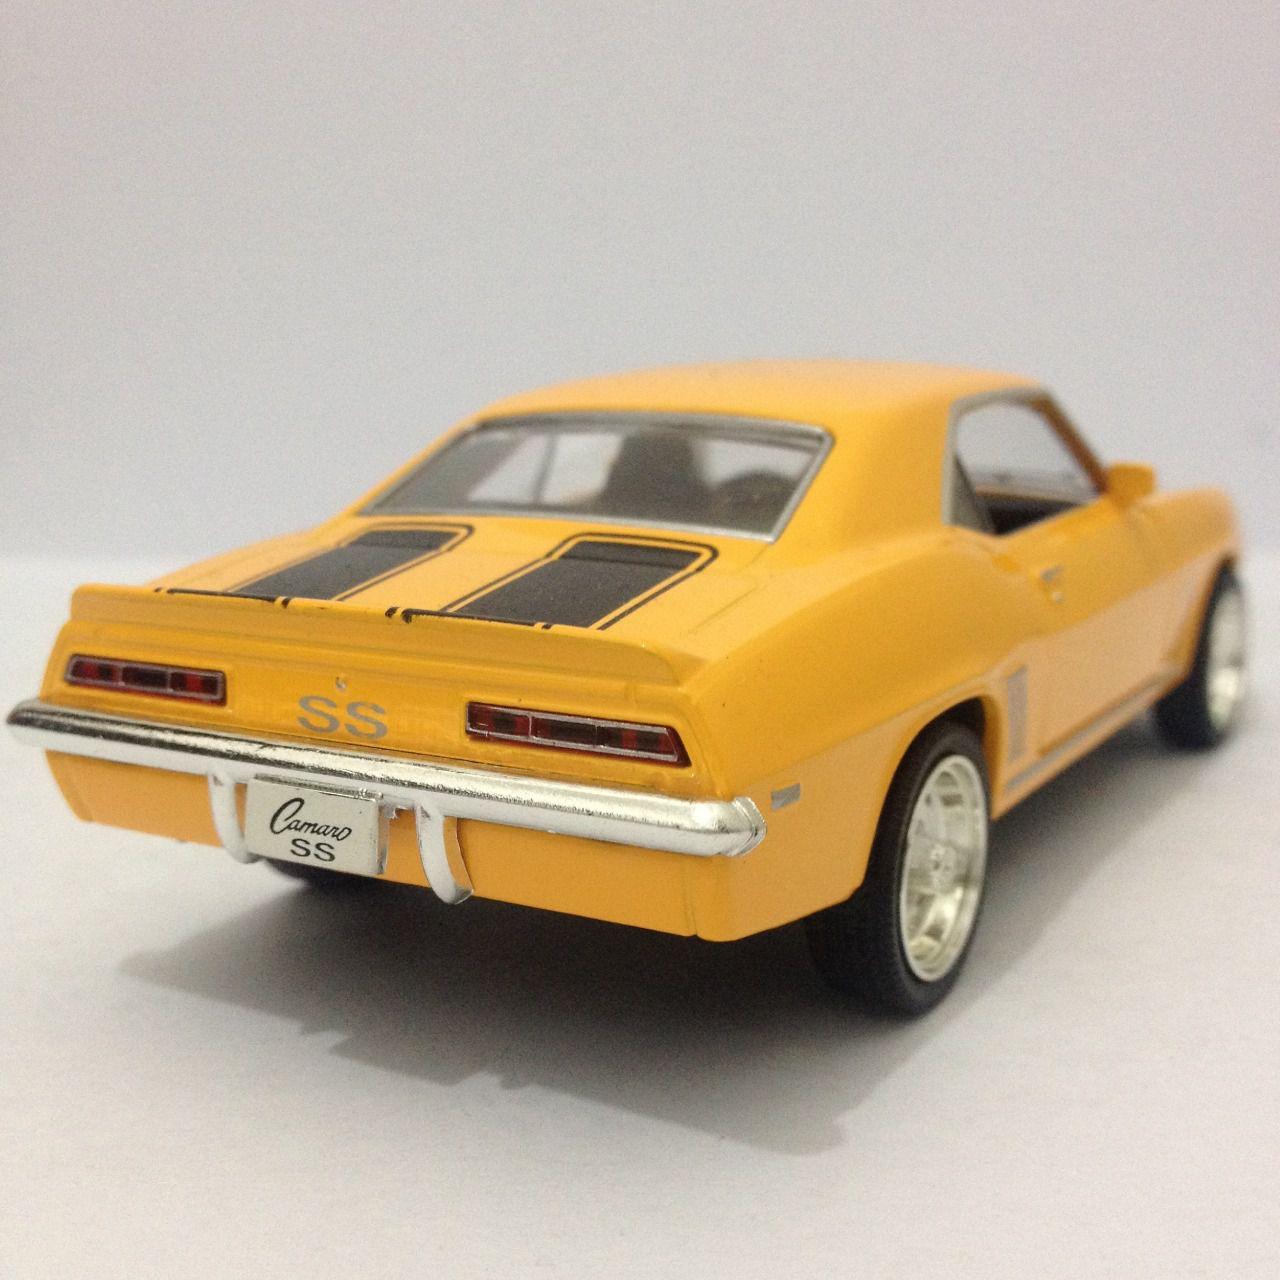 Chevrolet Camaro SS Amarelo- Escala 1:32